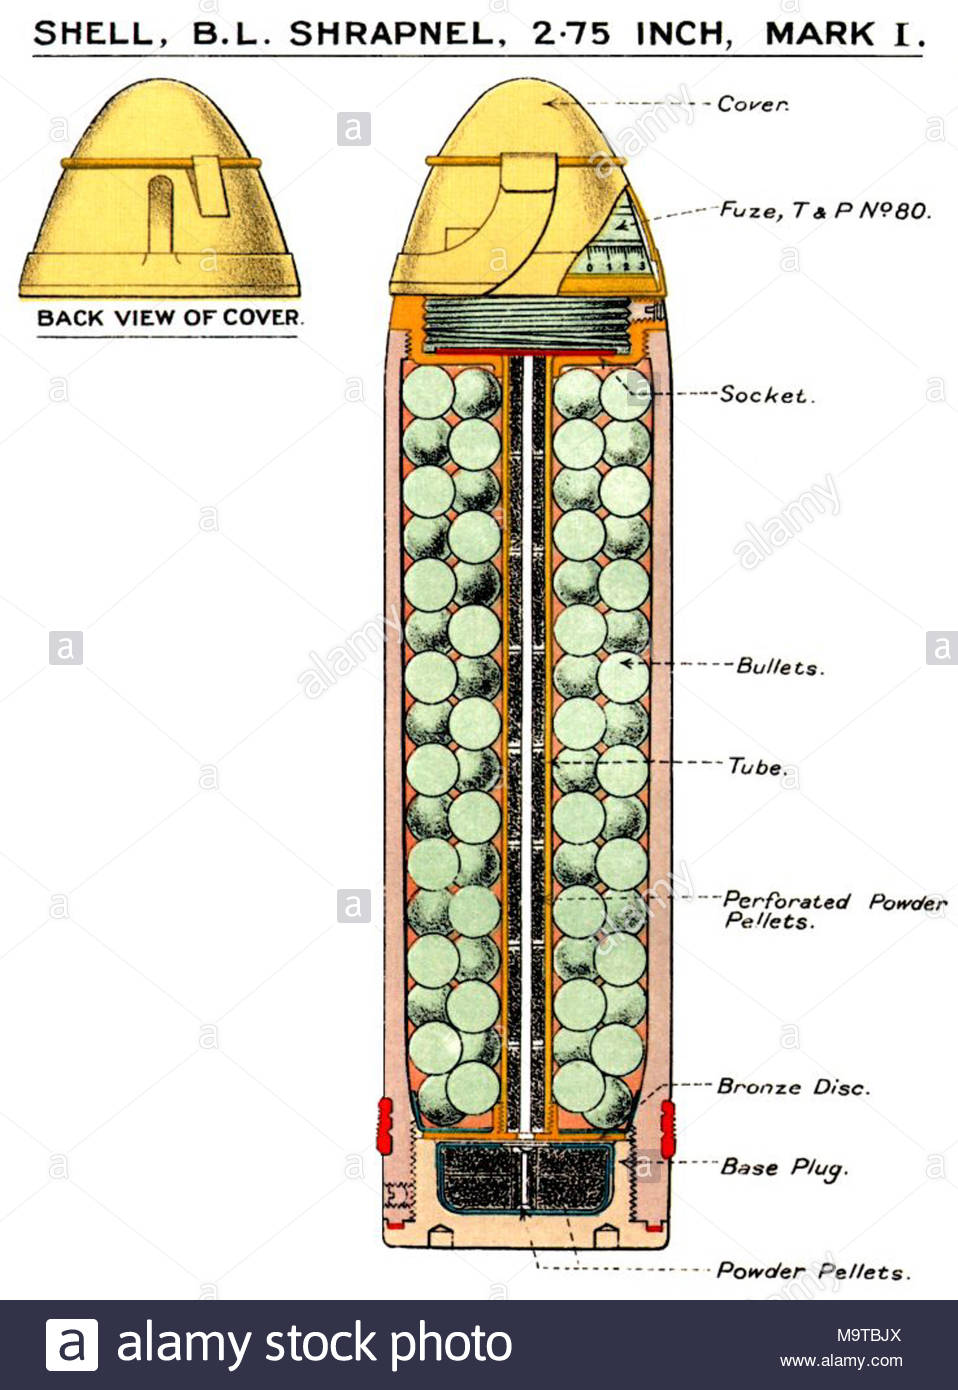 Diagram Of Mk I Shrapnel Shell For British Bl 275 Inch Mountain Gun Mountai Length